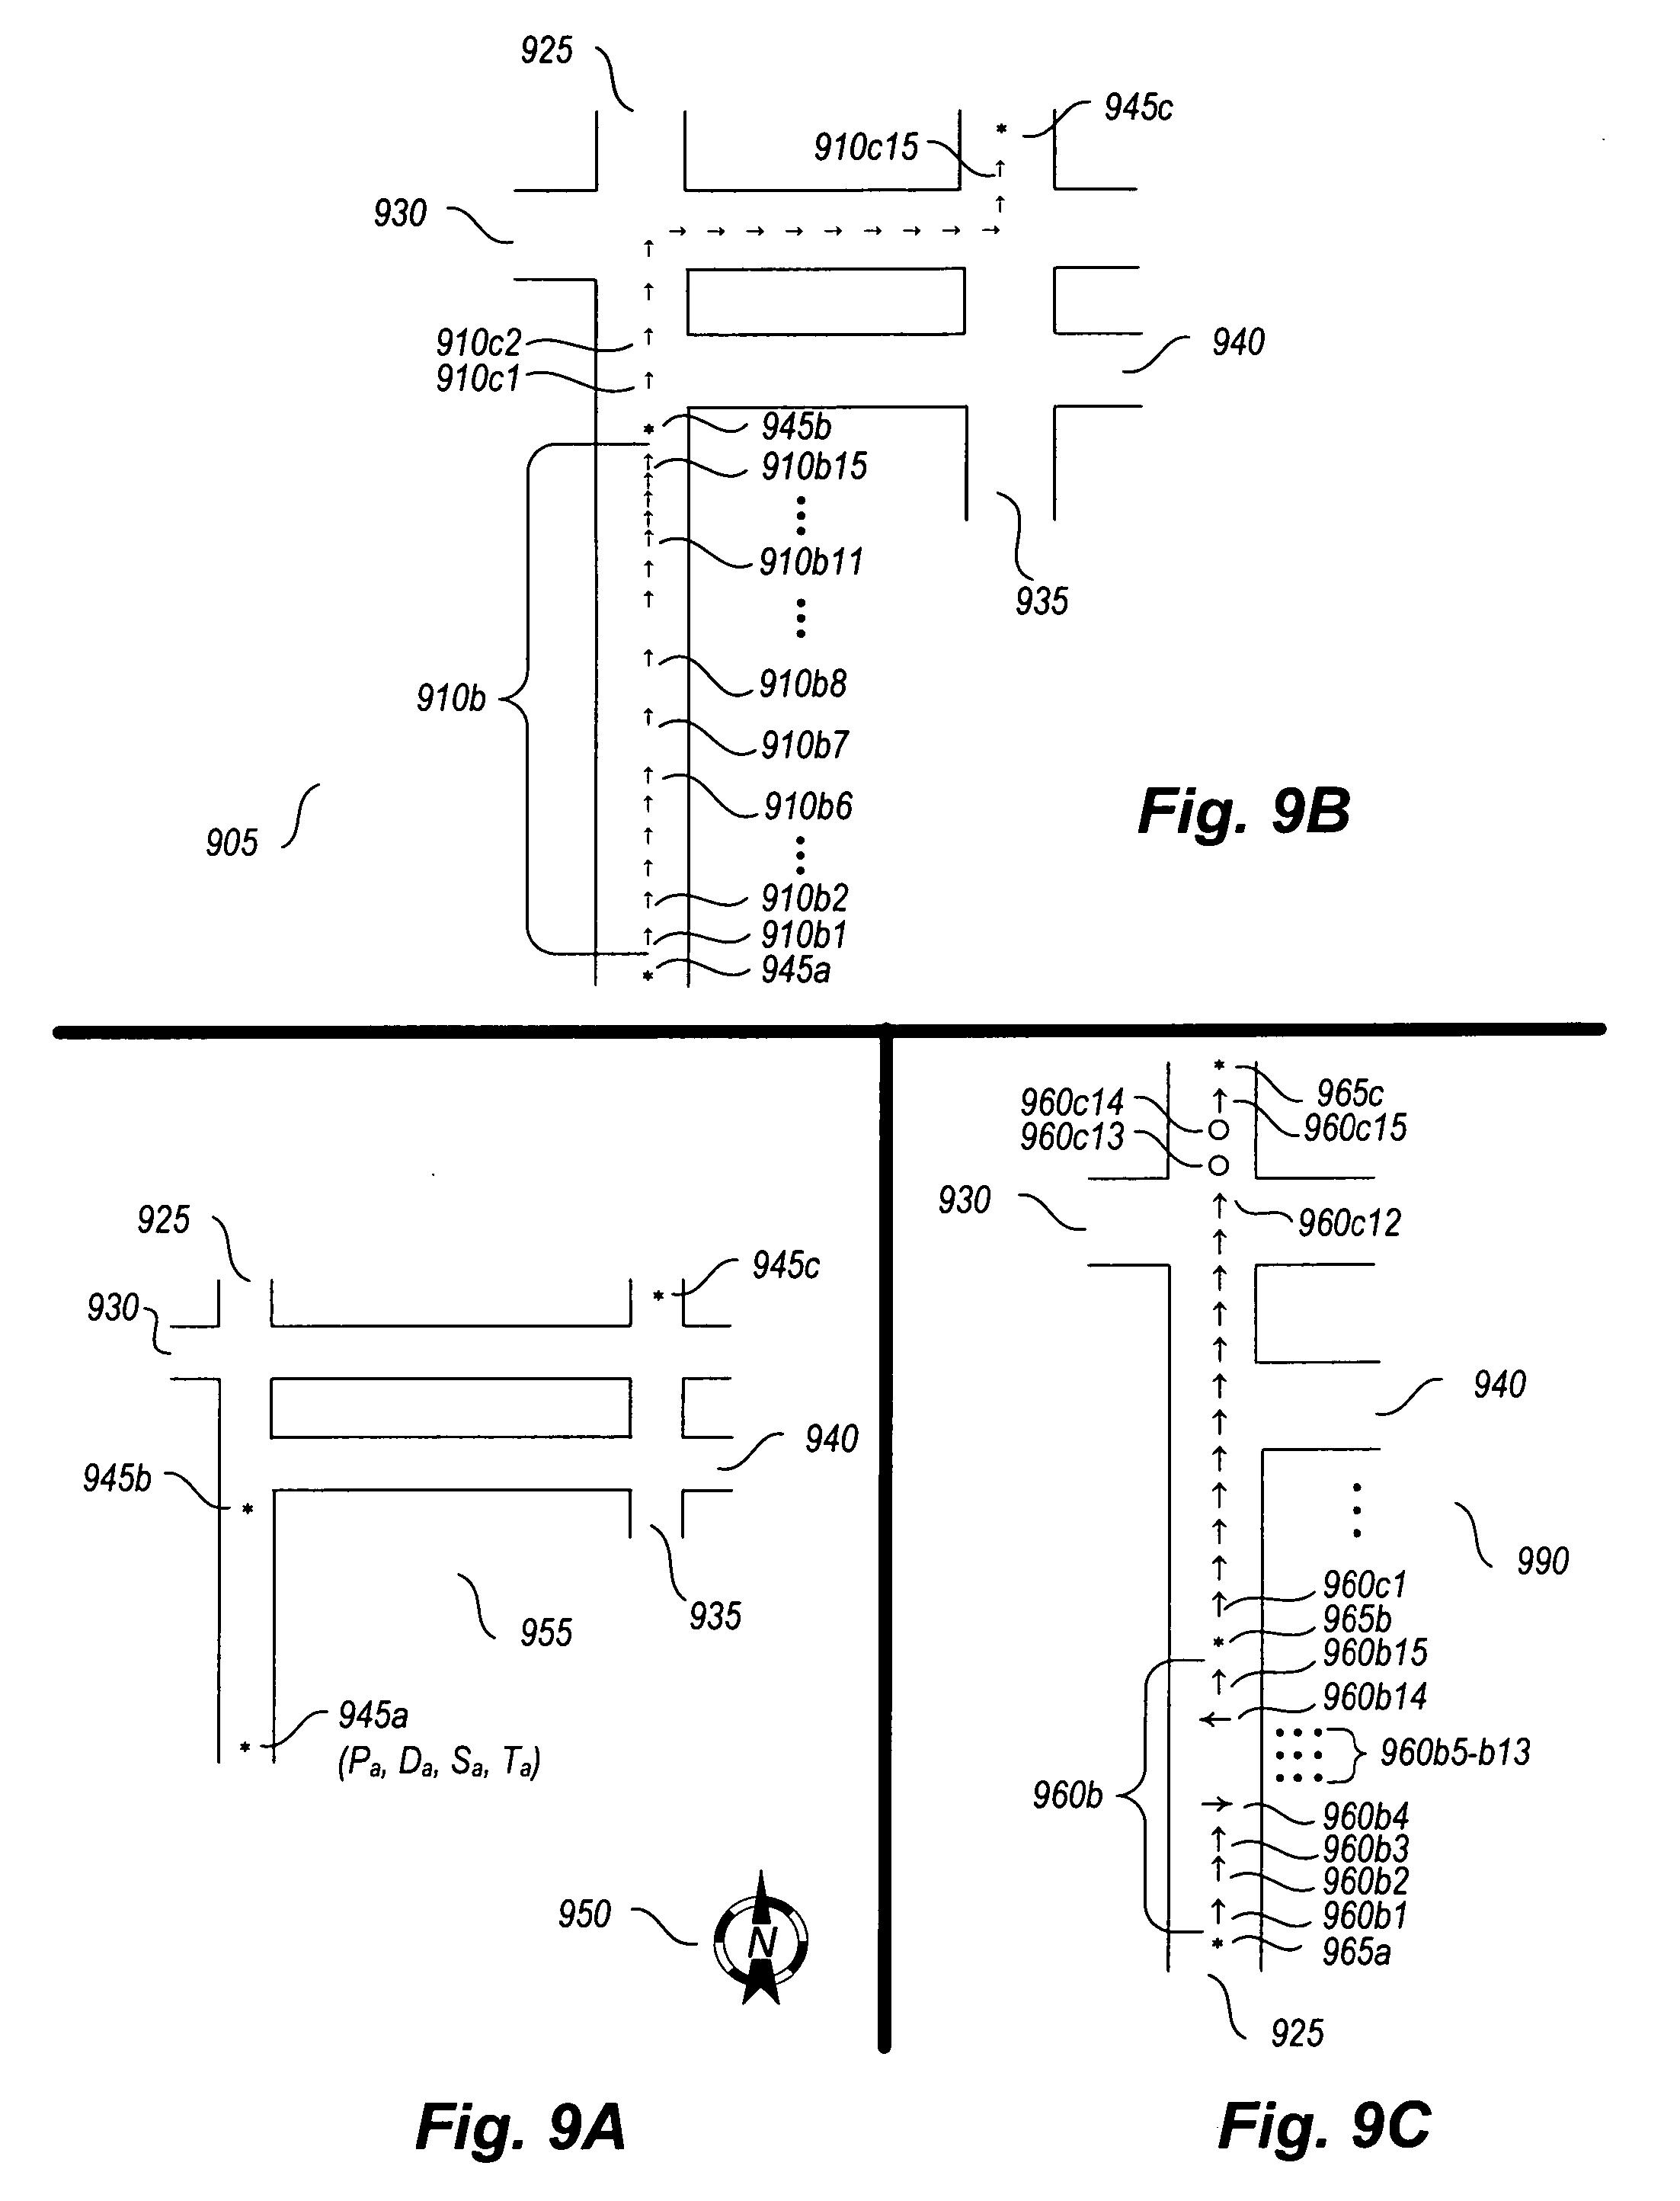 Cmos Logic Probe Circuit Diagram Tradeoficcom Wiring Diagrams Source Schematic Fm For Instrumentation Schema